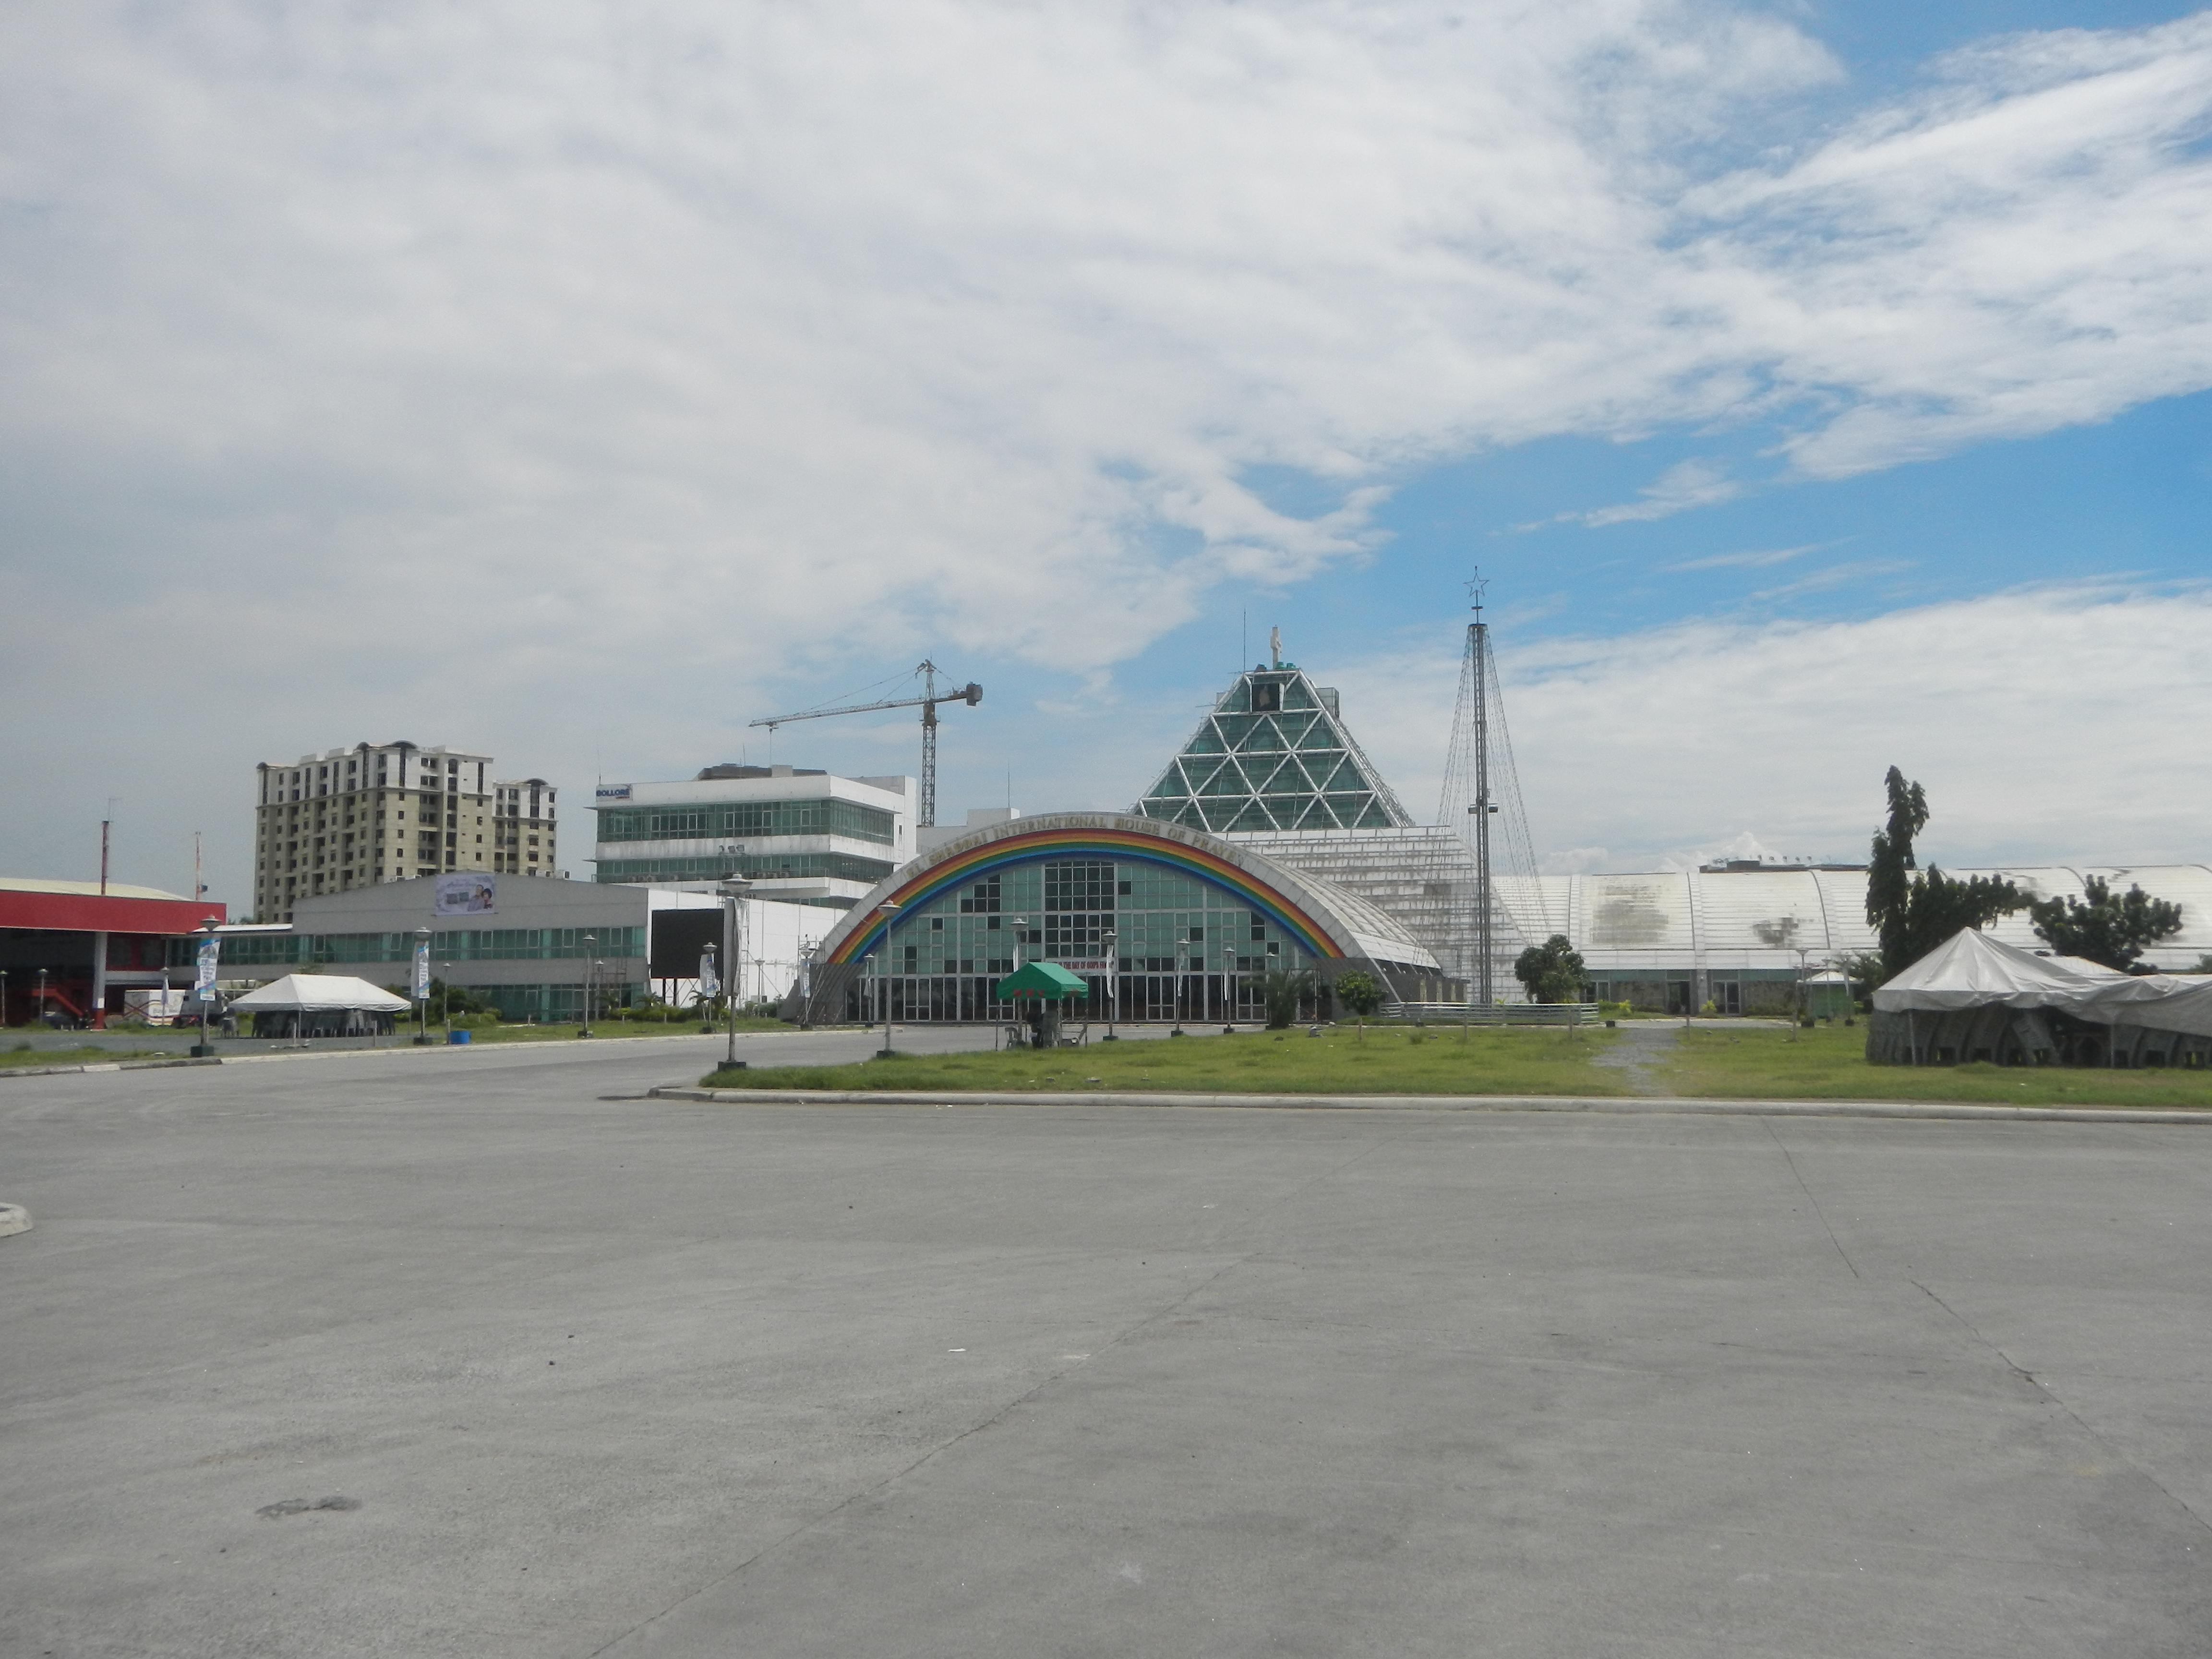 File:2632El Shaddai International House Of Prayer Parañaque City 02